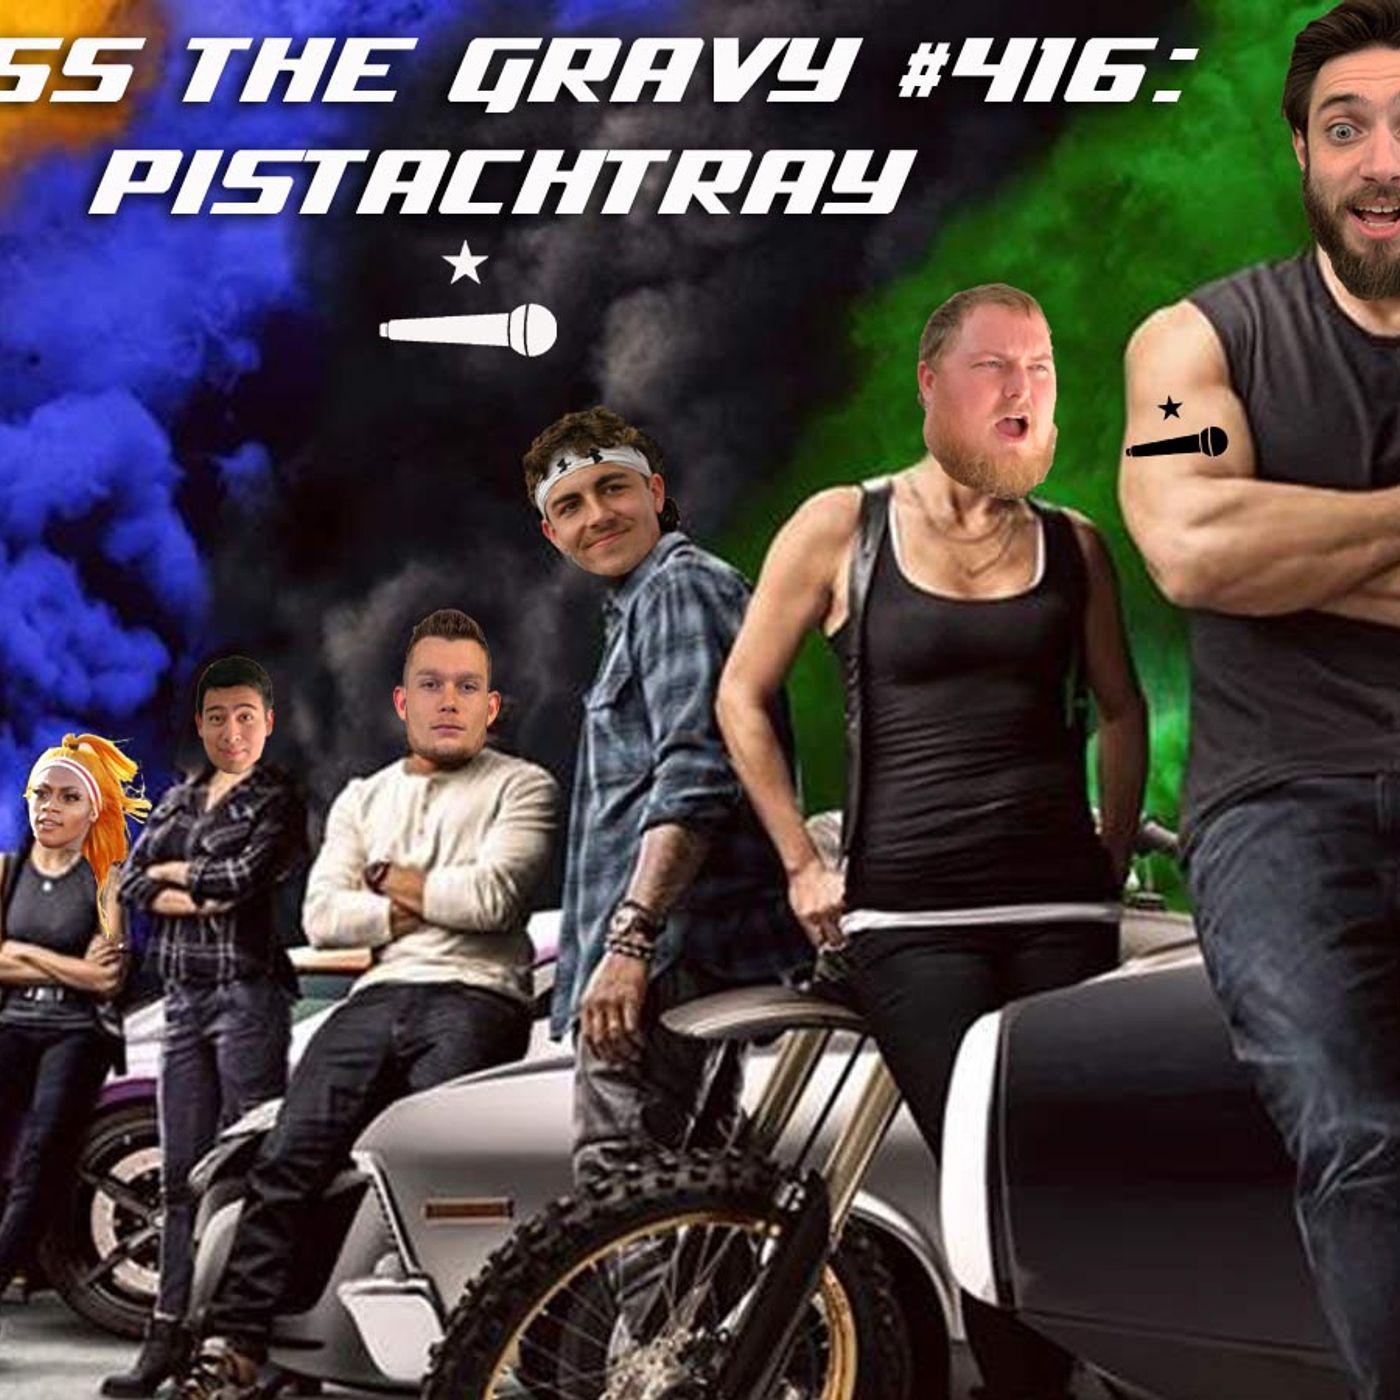 Pass The Gravy #416: Pistachtray